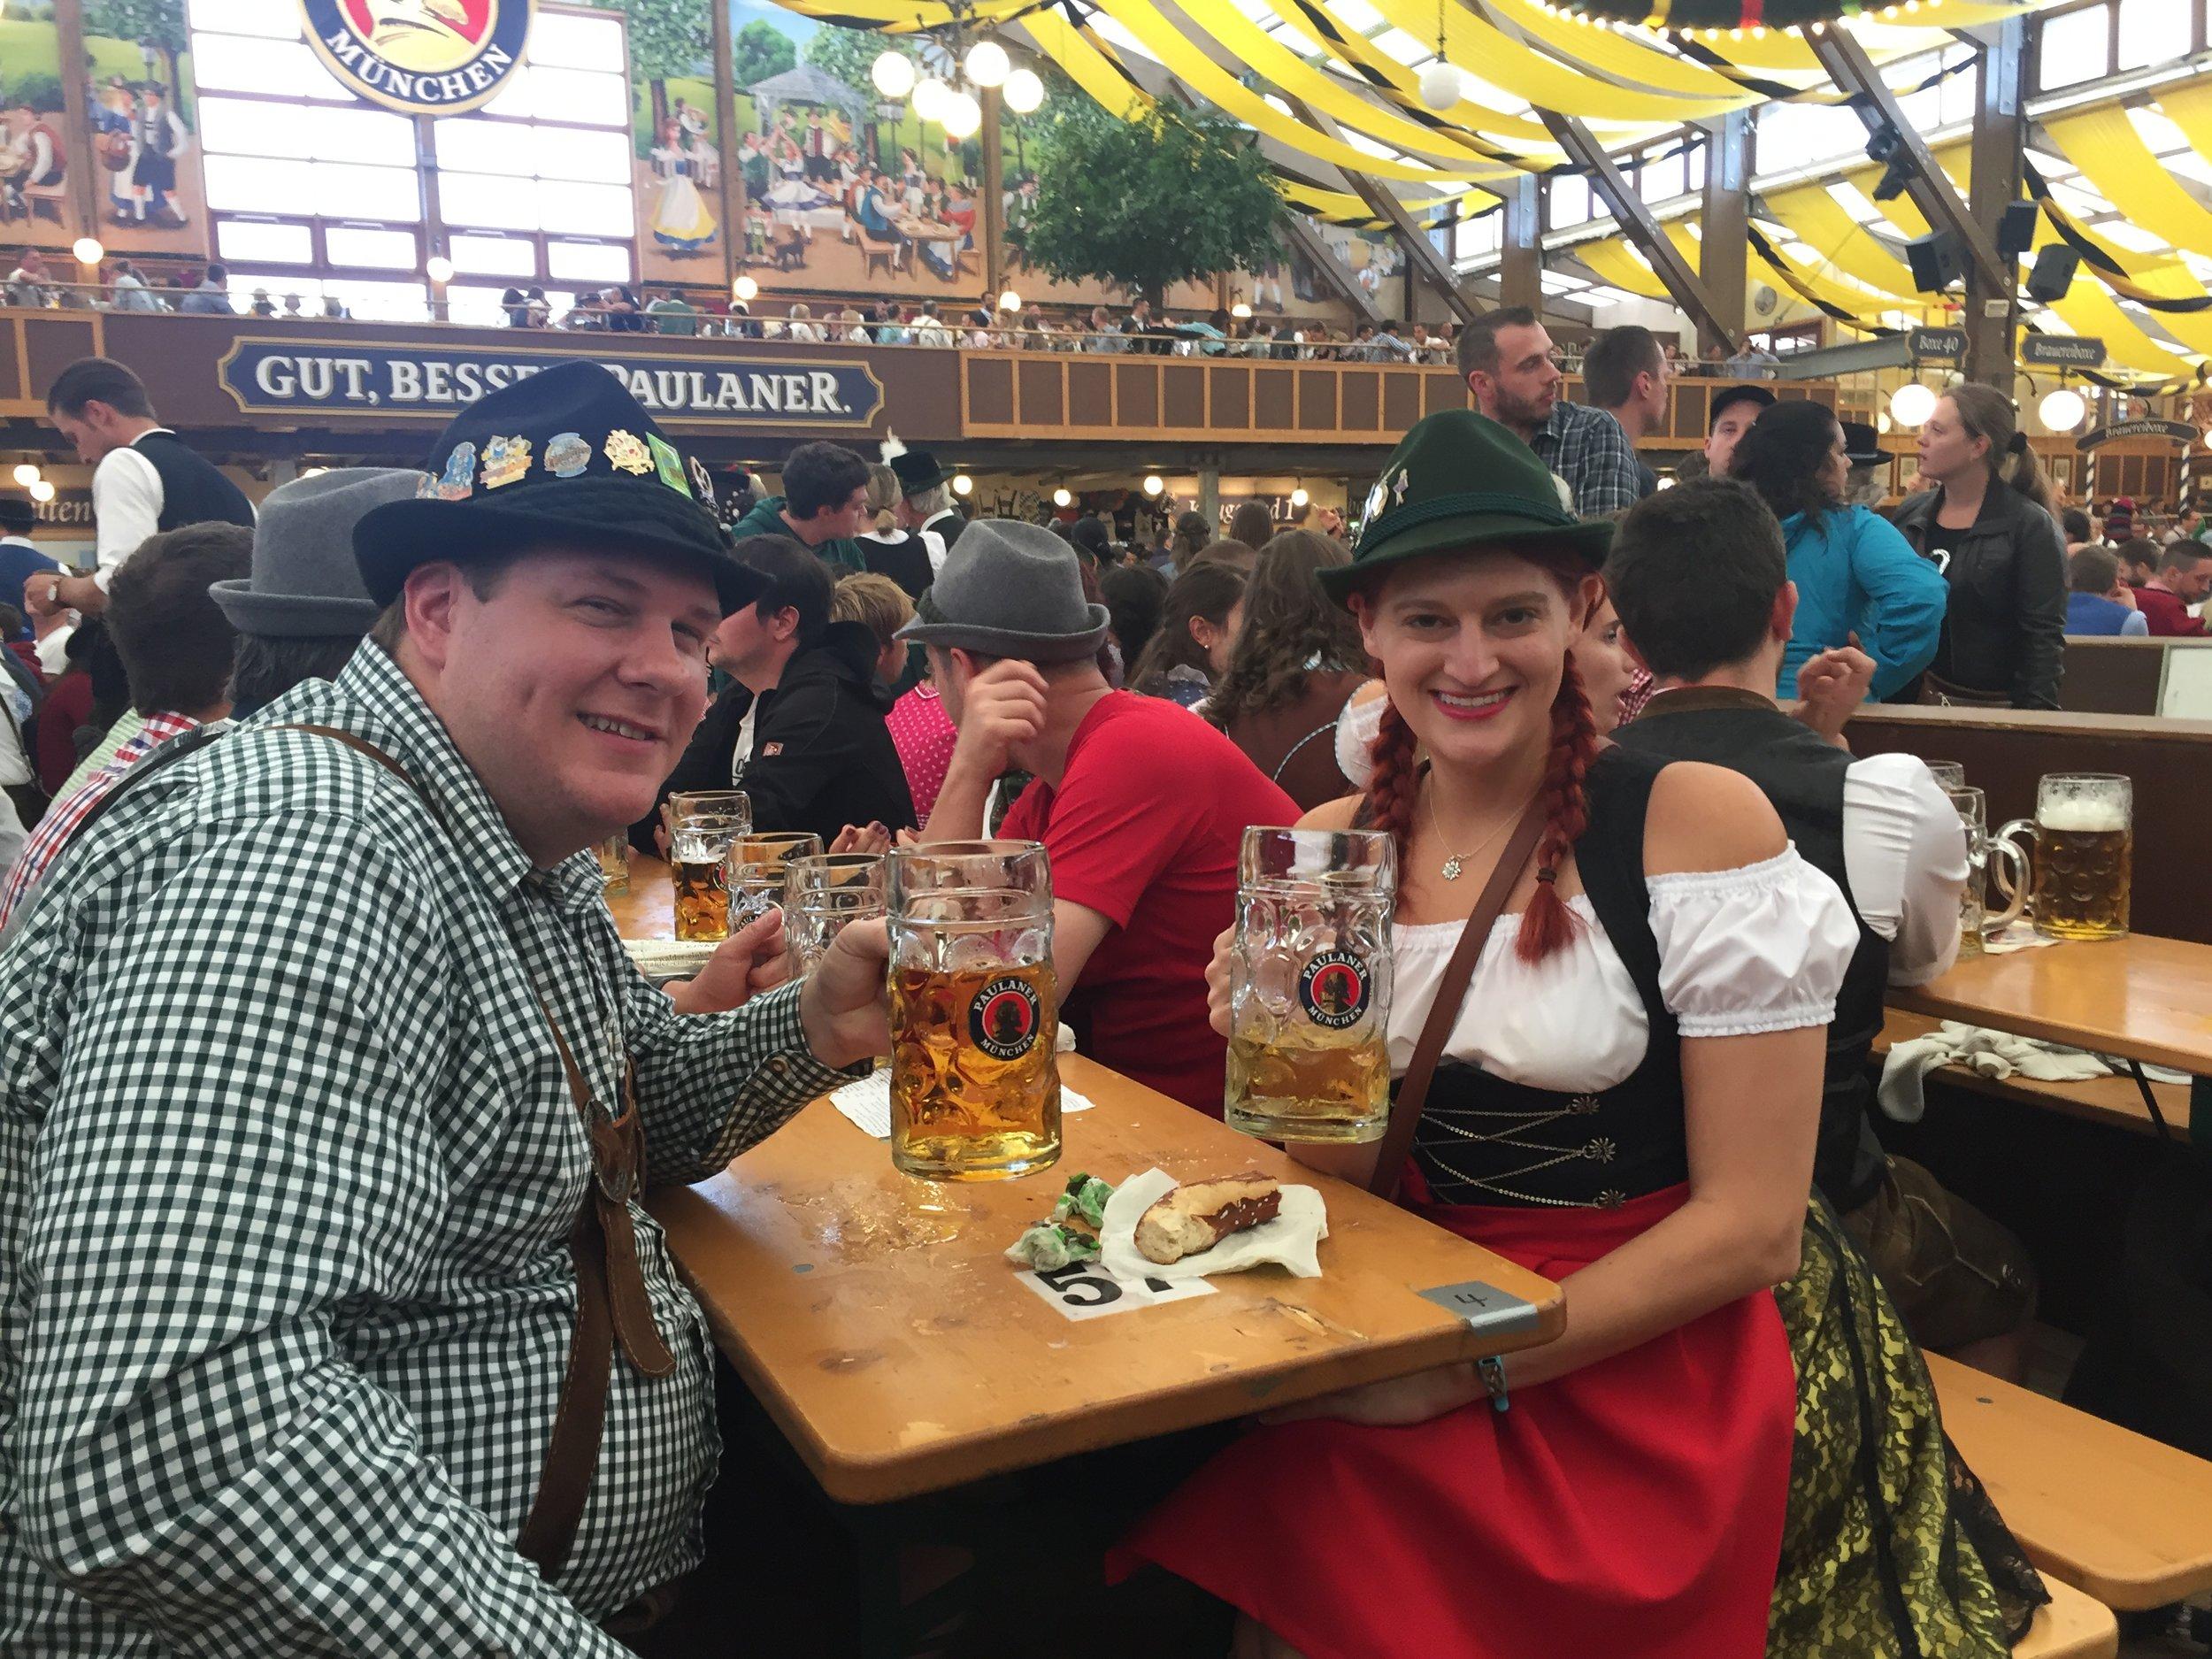 Our honeymoon in the PAULANER FESTZELT - WINZERER FÄHNDL - OKTOBERFEST 2016